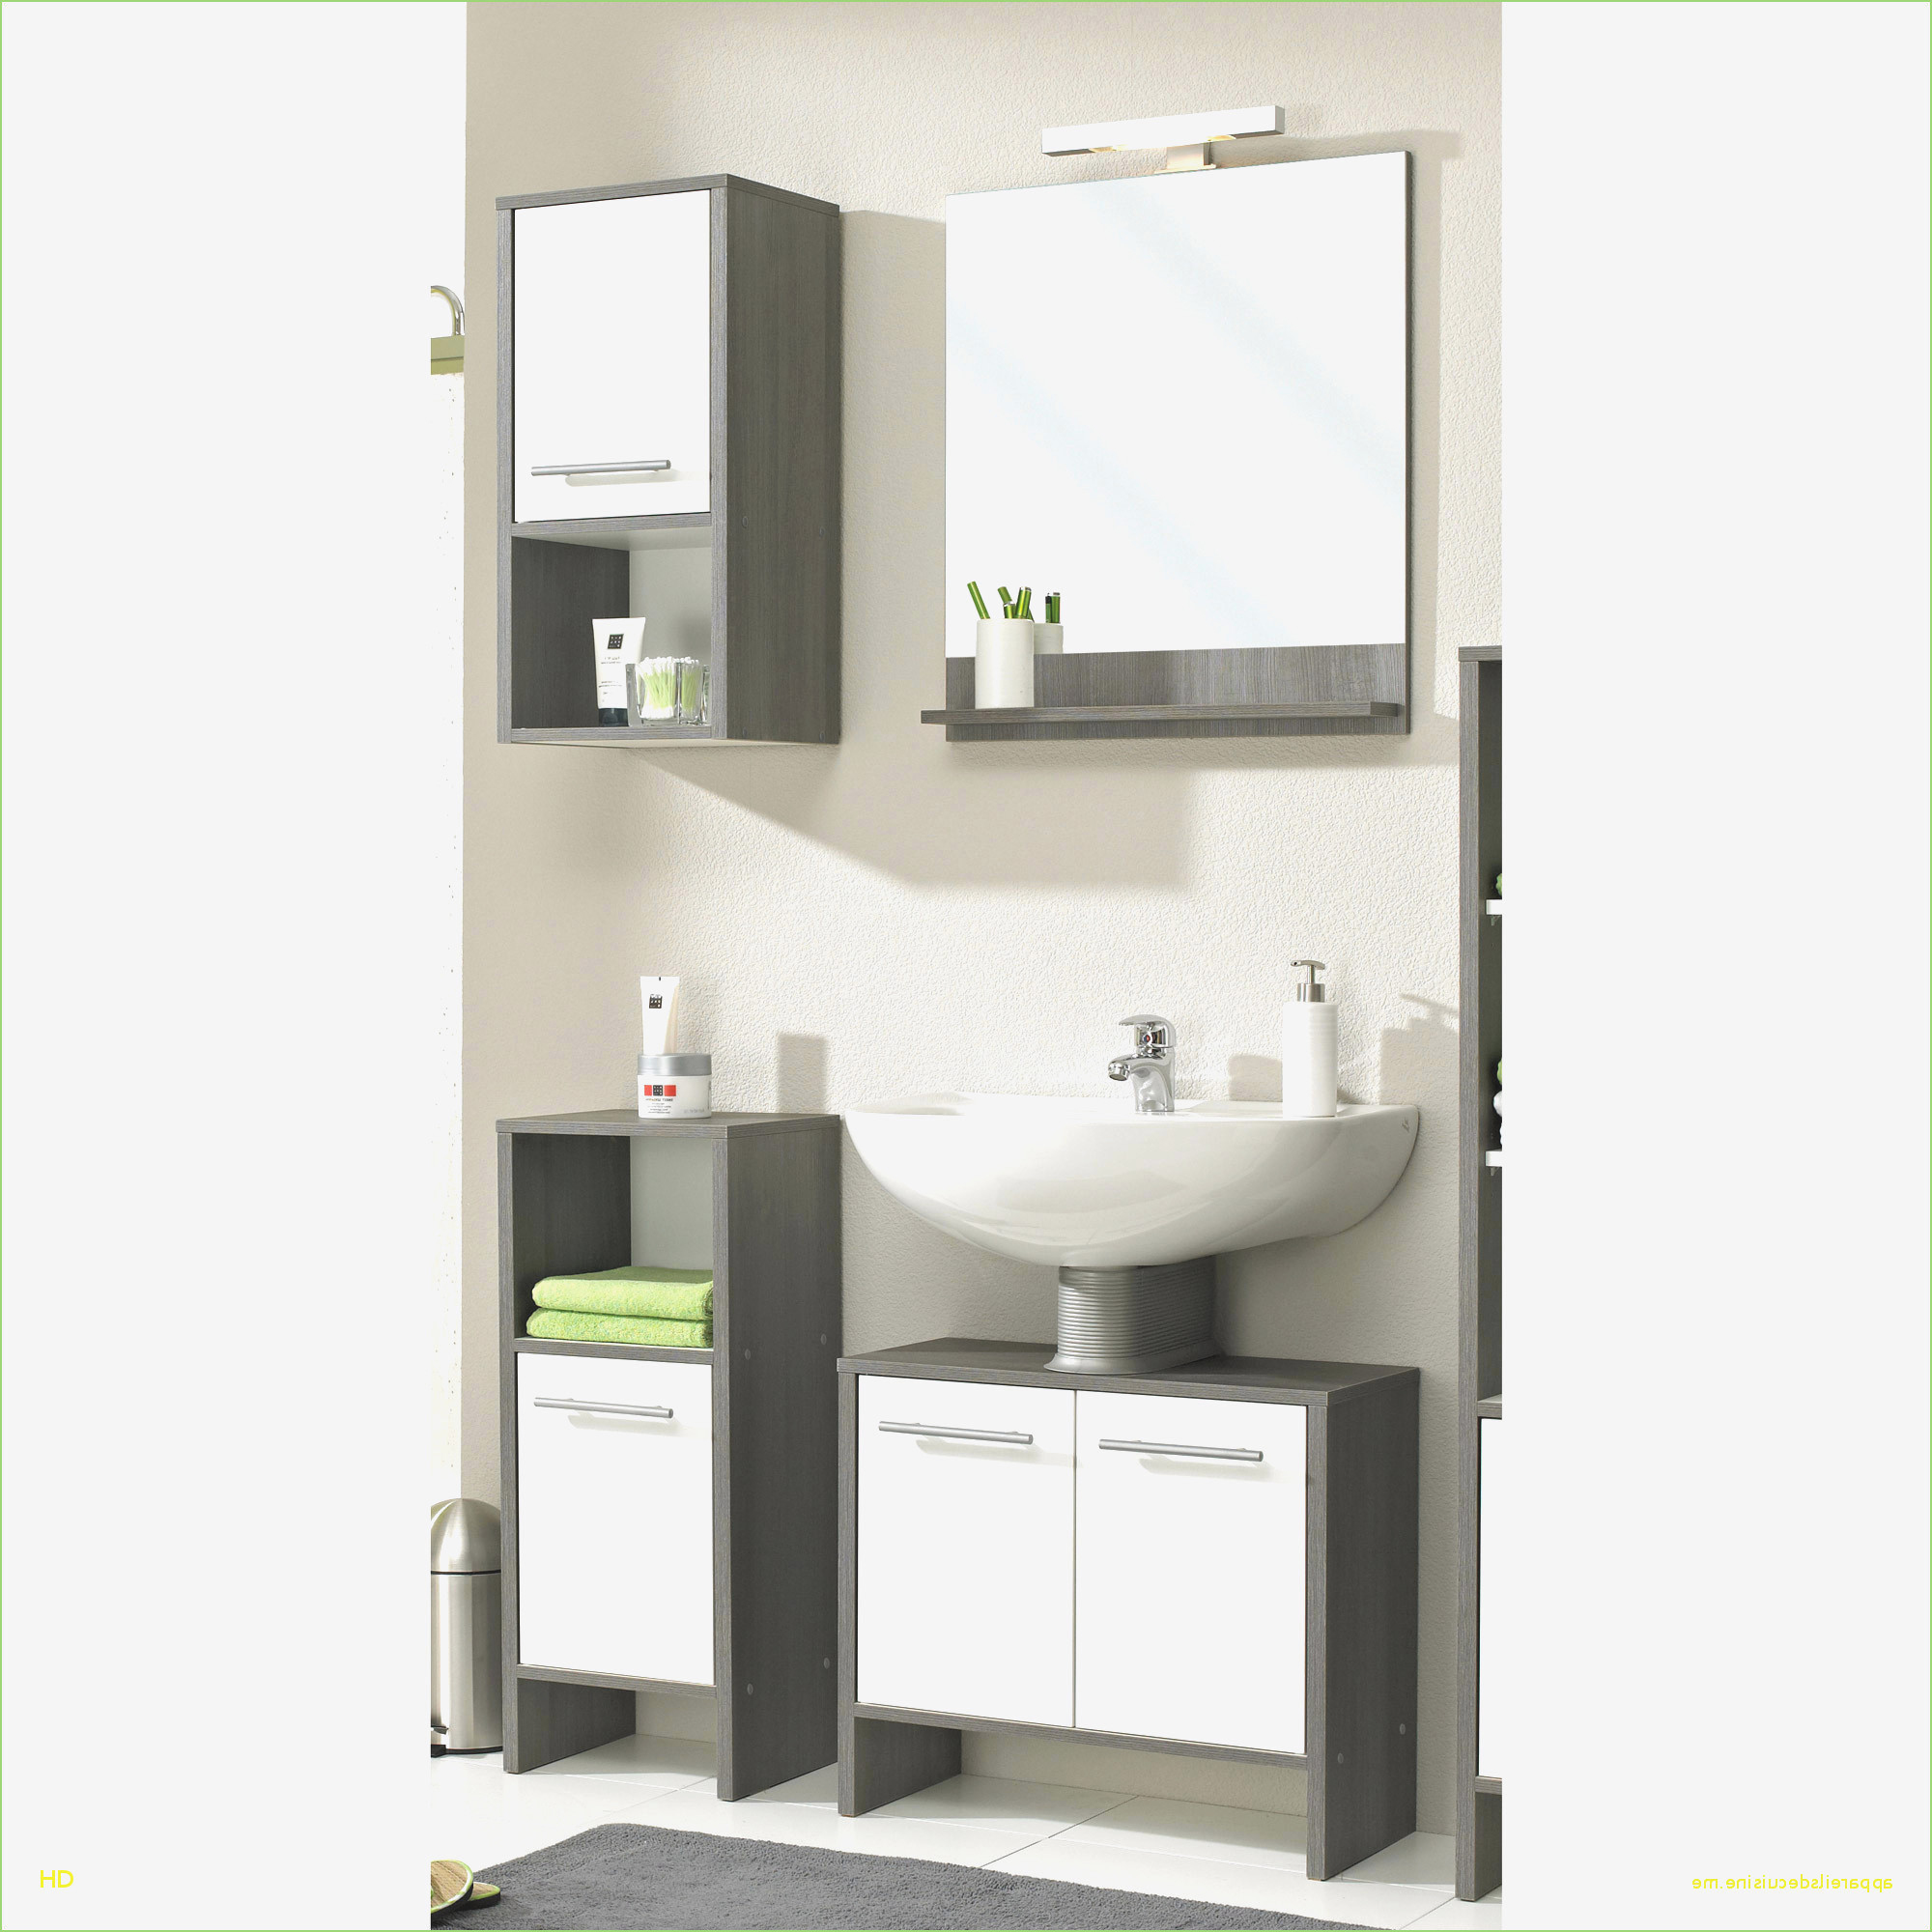 Leroy Merlin Armoire De toilette Inspirant Image Saale Dentaltechnik Halle Archives Bain